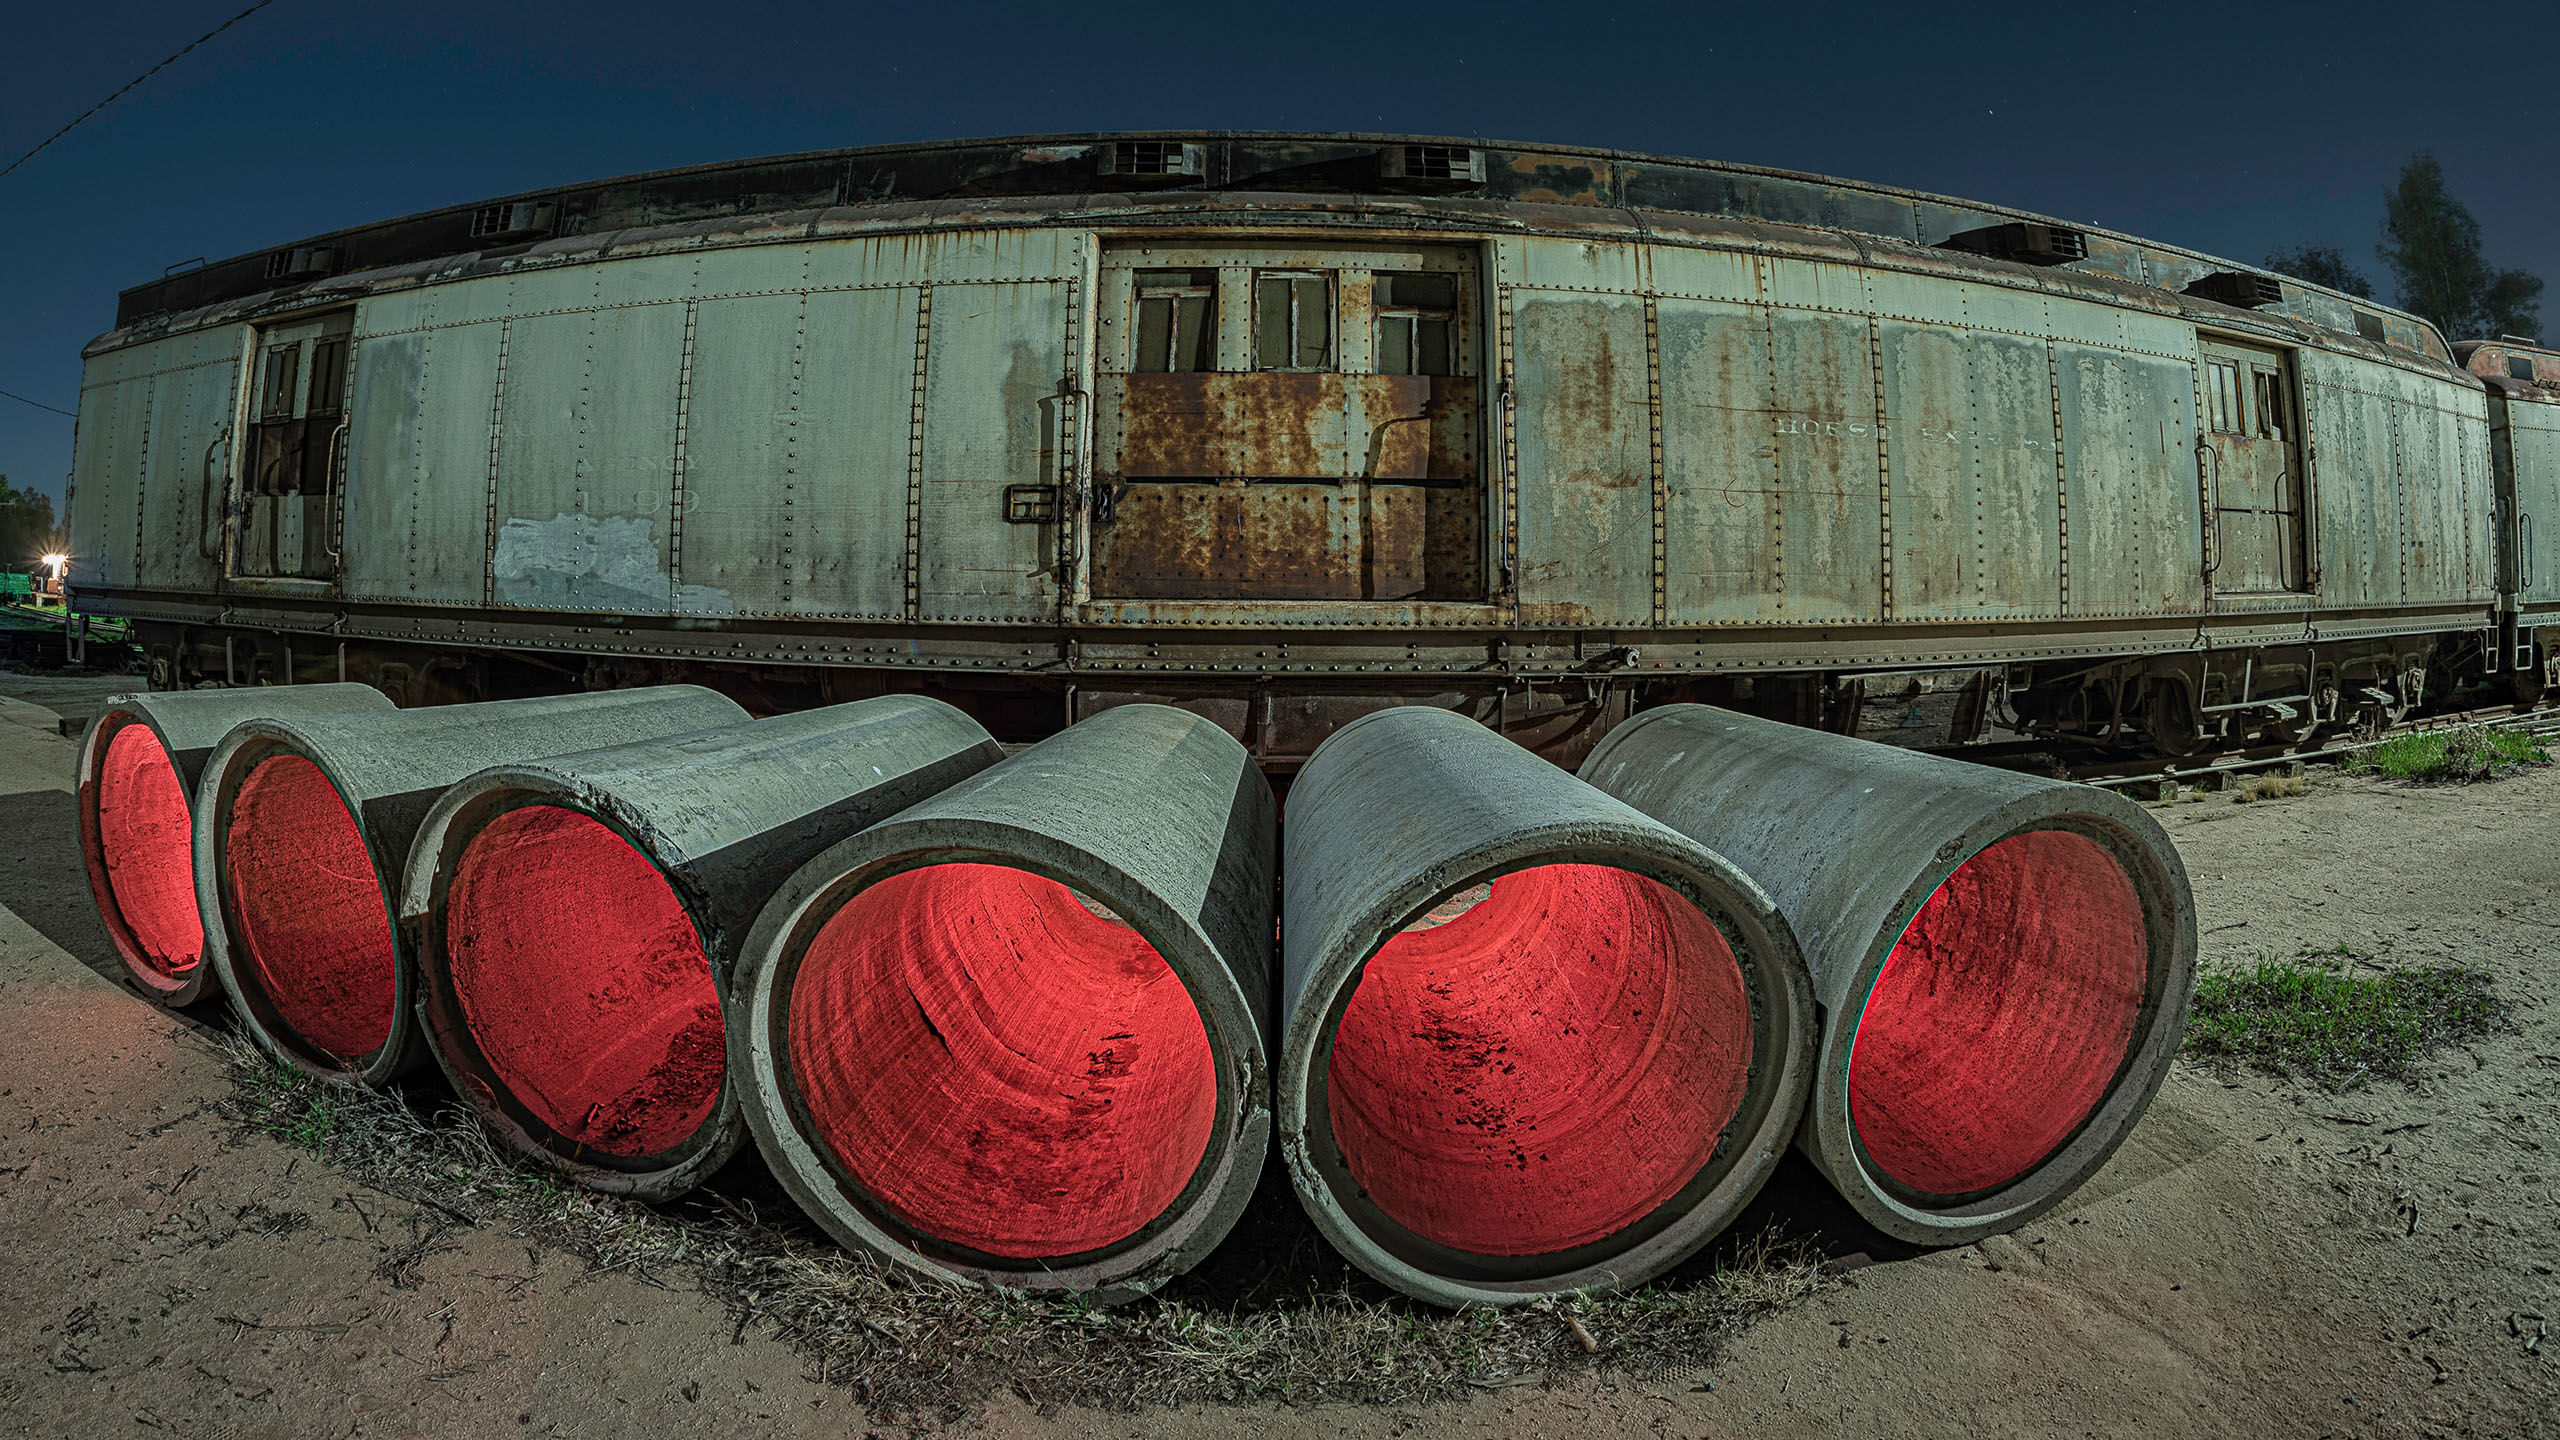 7717_kenlee_southerncaliforniarailwaymuseum_210328_0002_56sf8iso200_fisheye_cementpipes-train-red HEADER PHOTOFOCUS